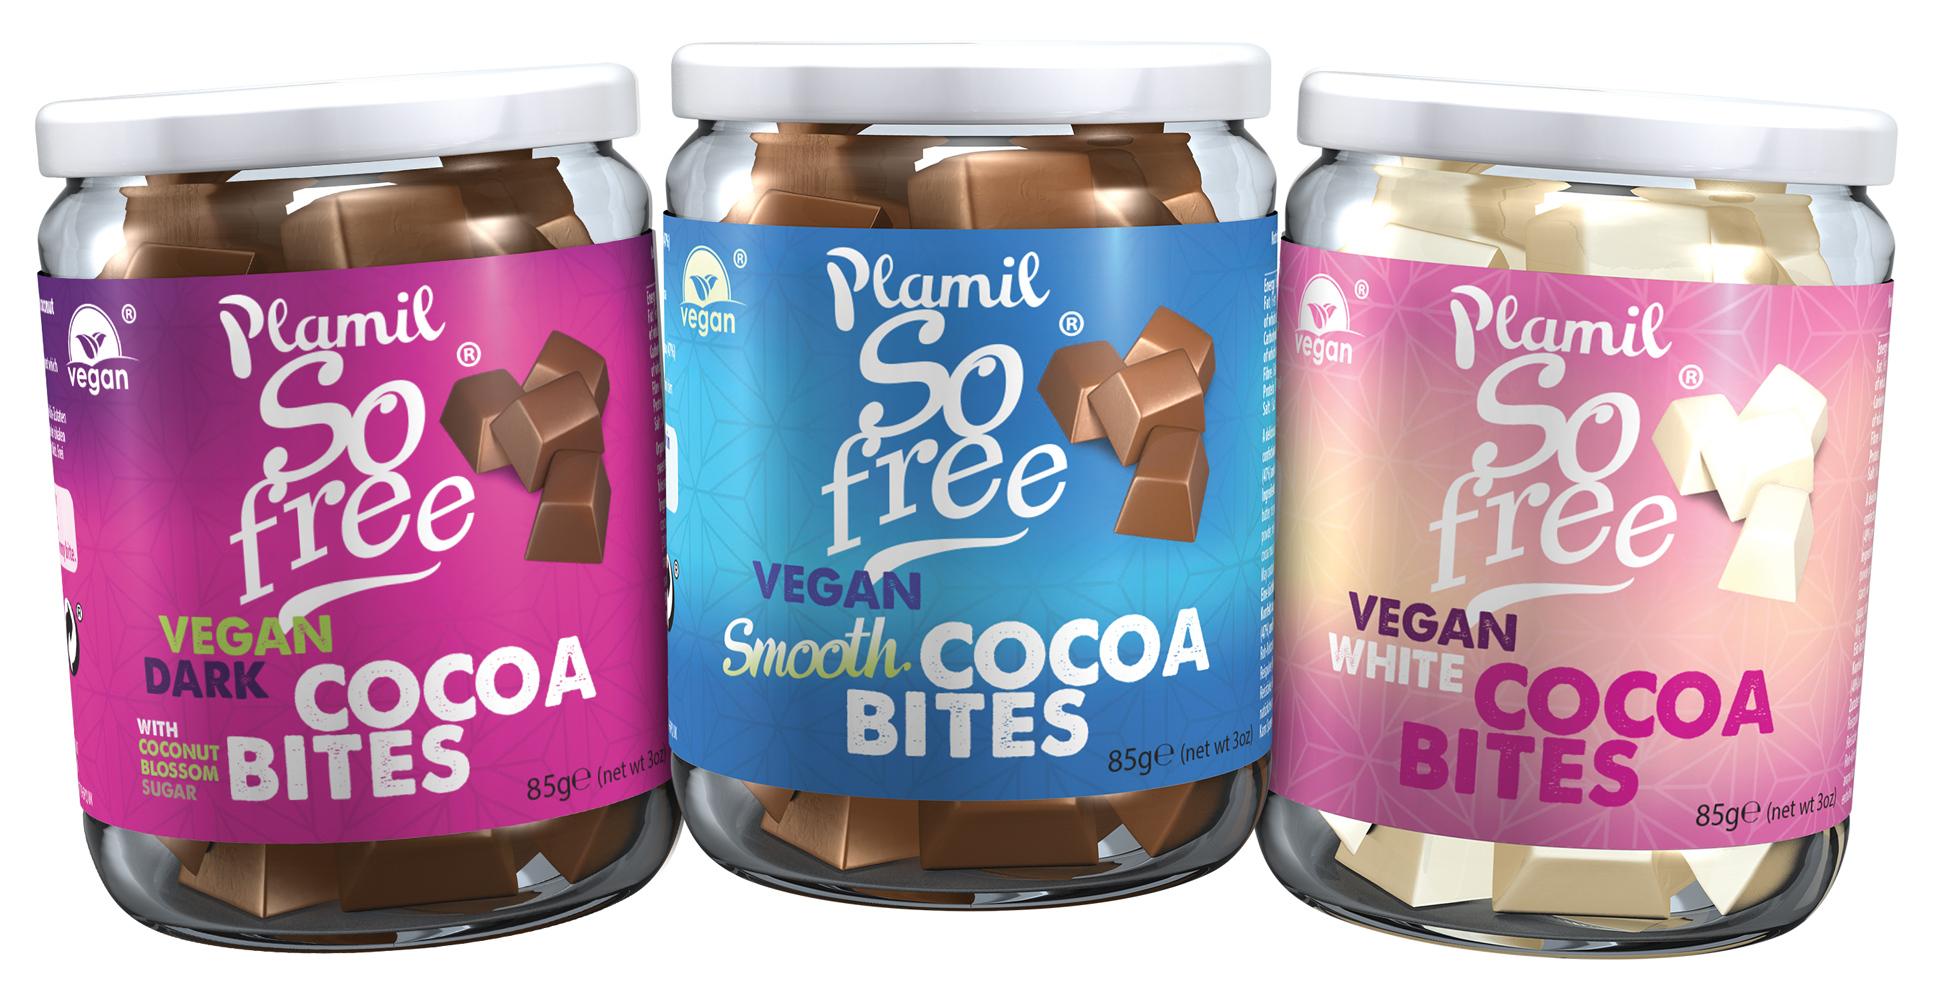 Plamil Cocoa bites